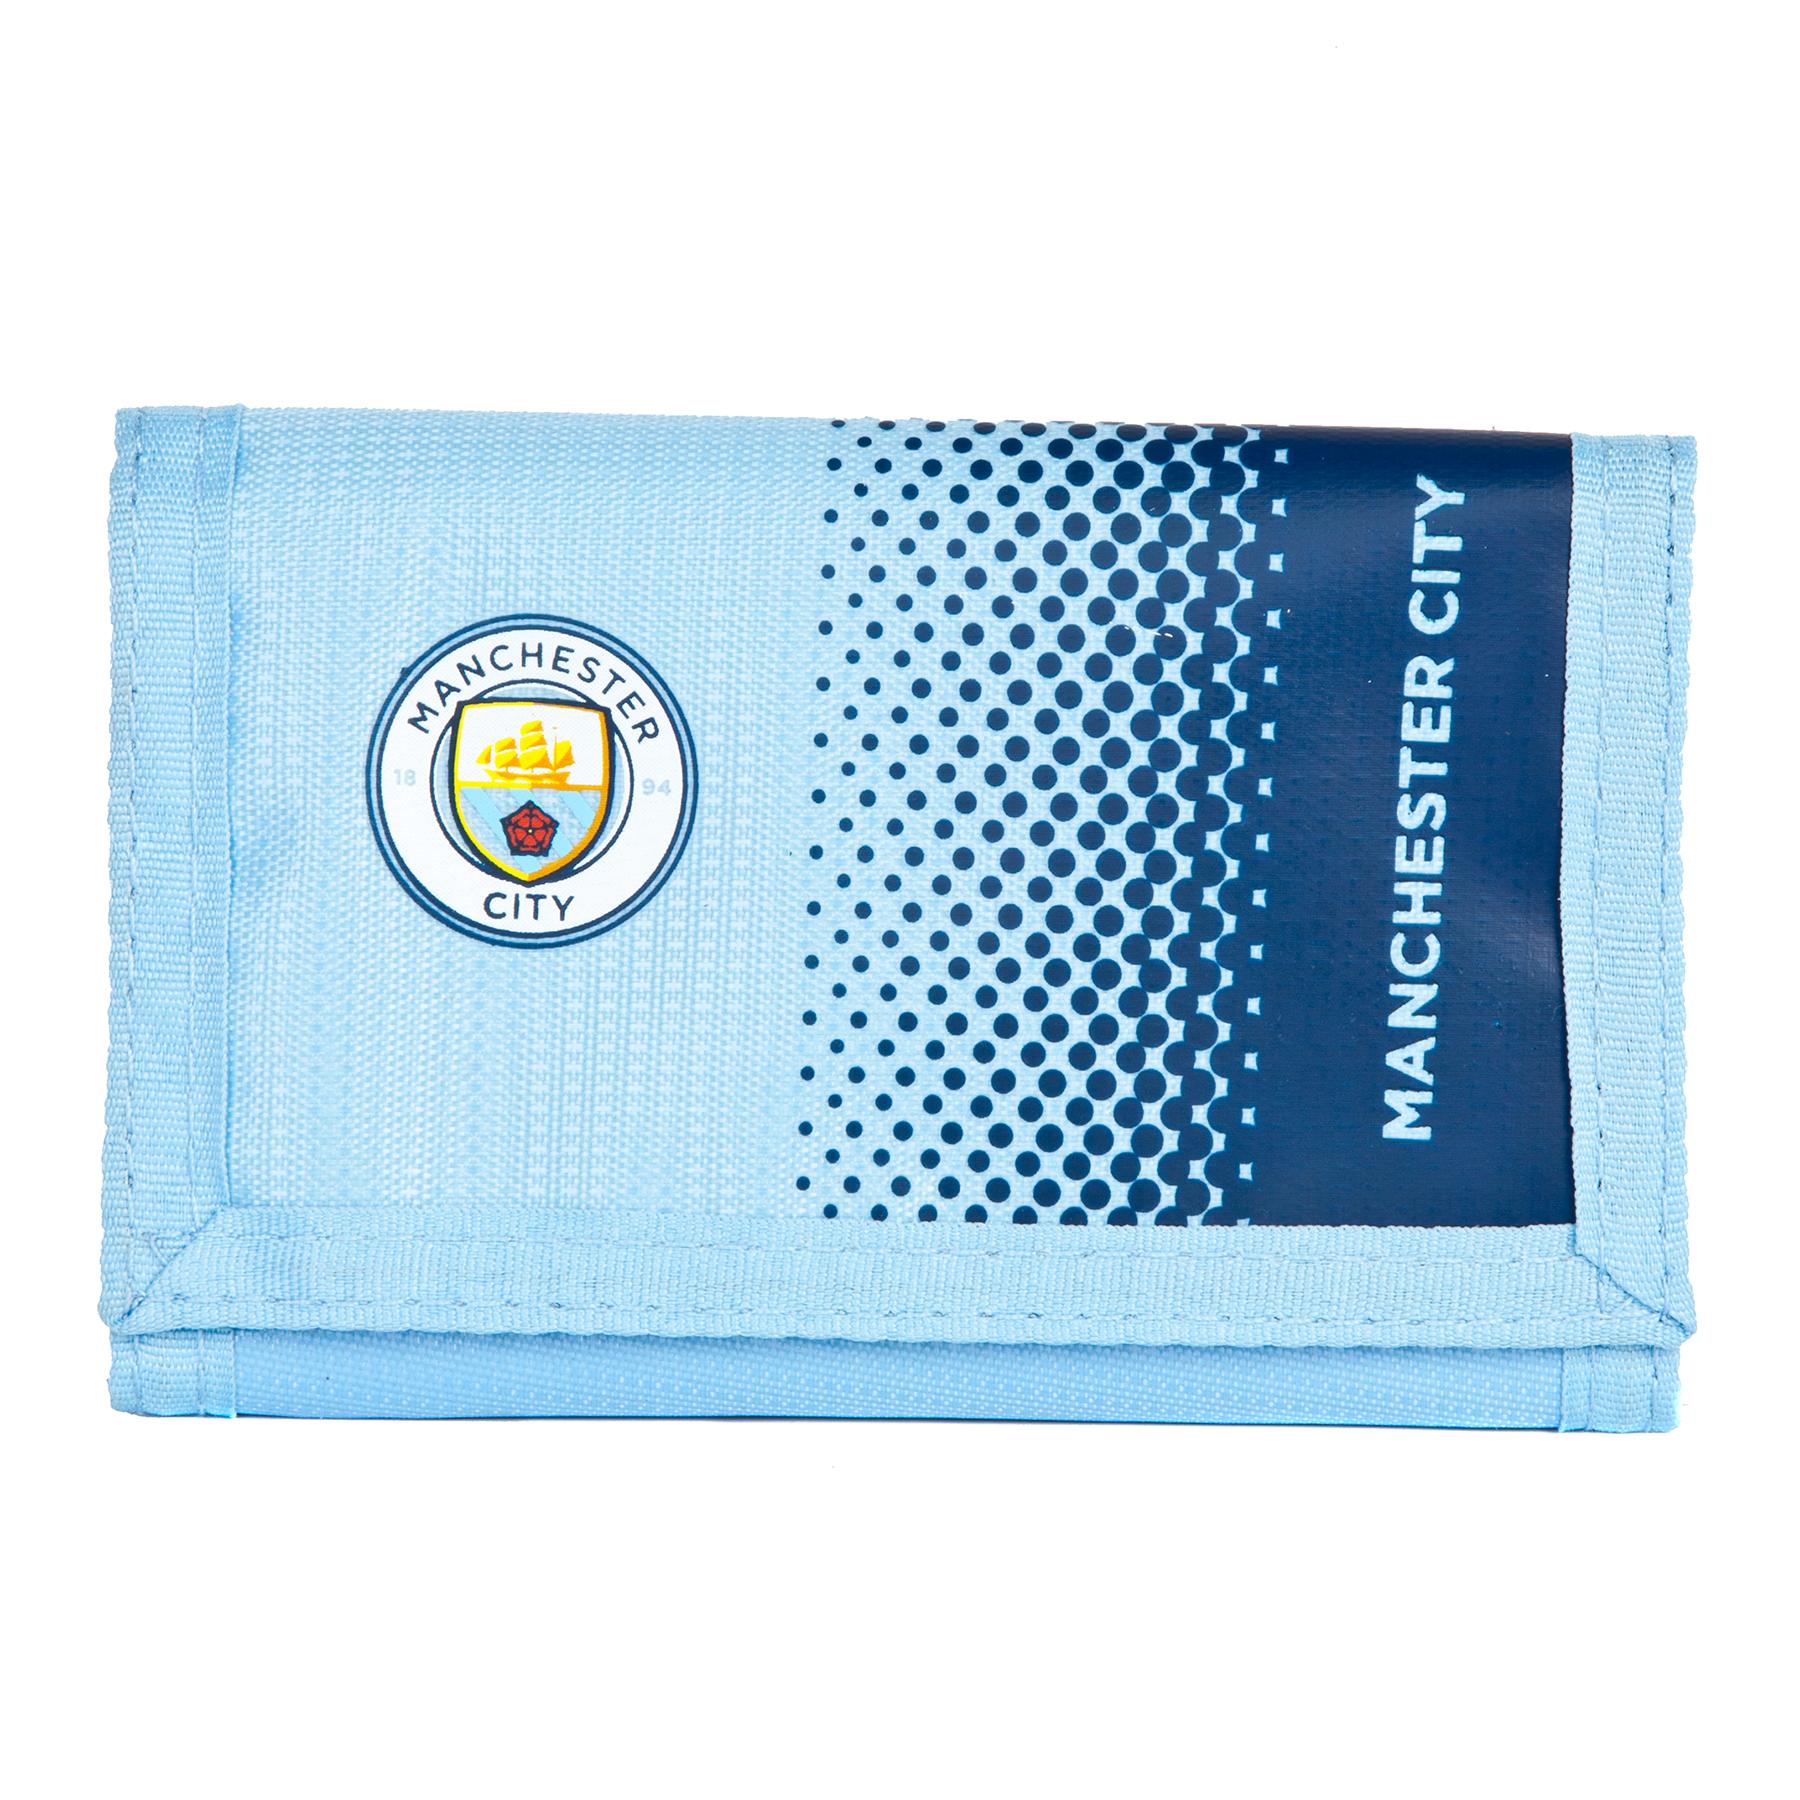 Manchester City Fade Wallet